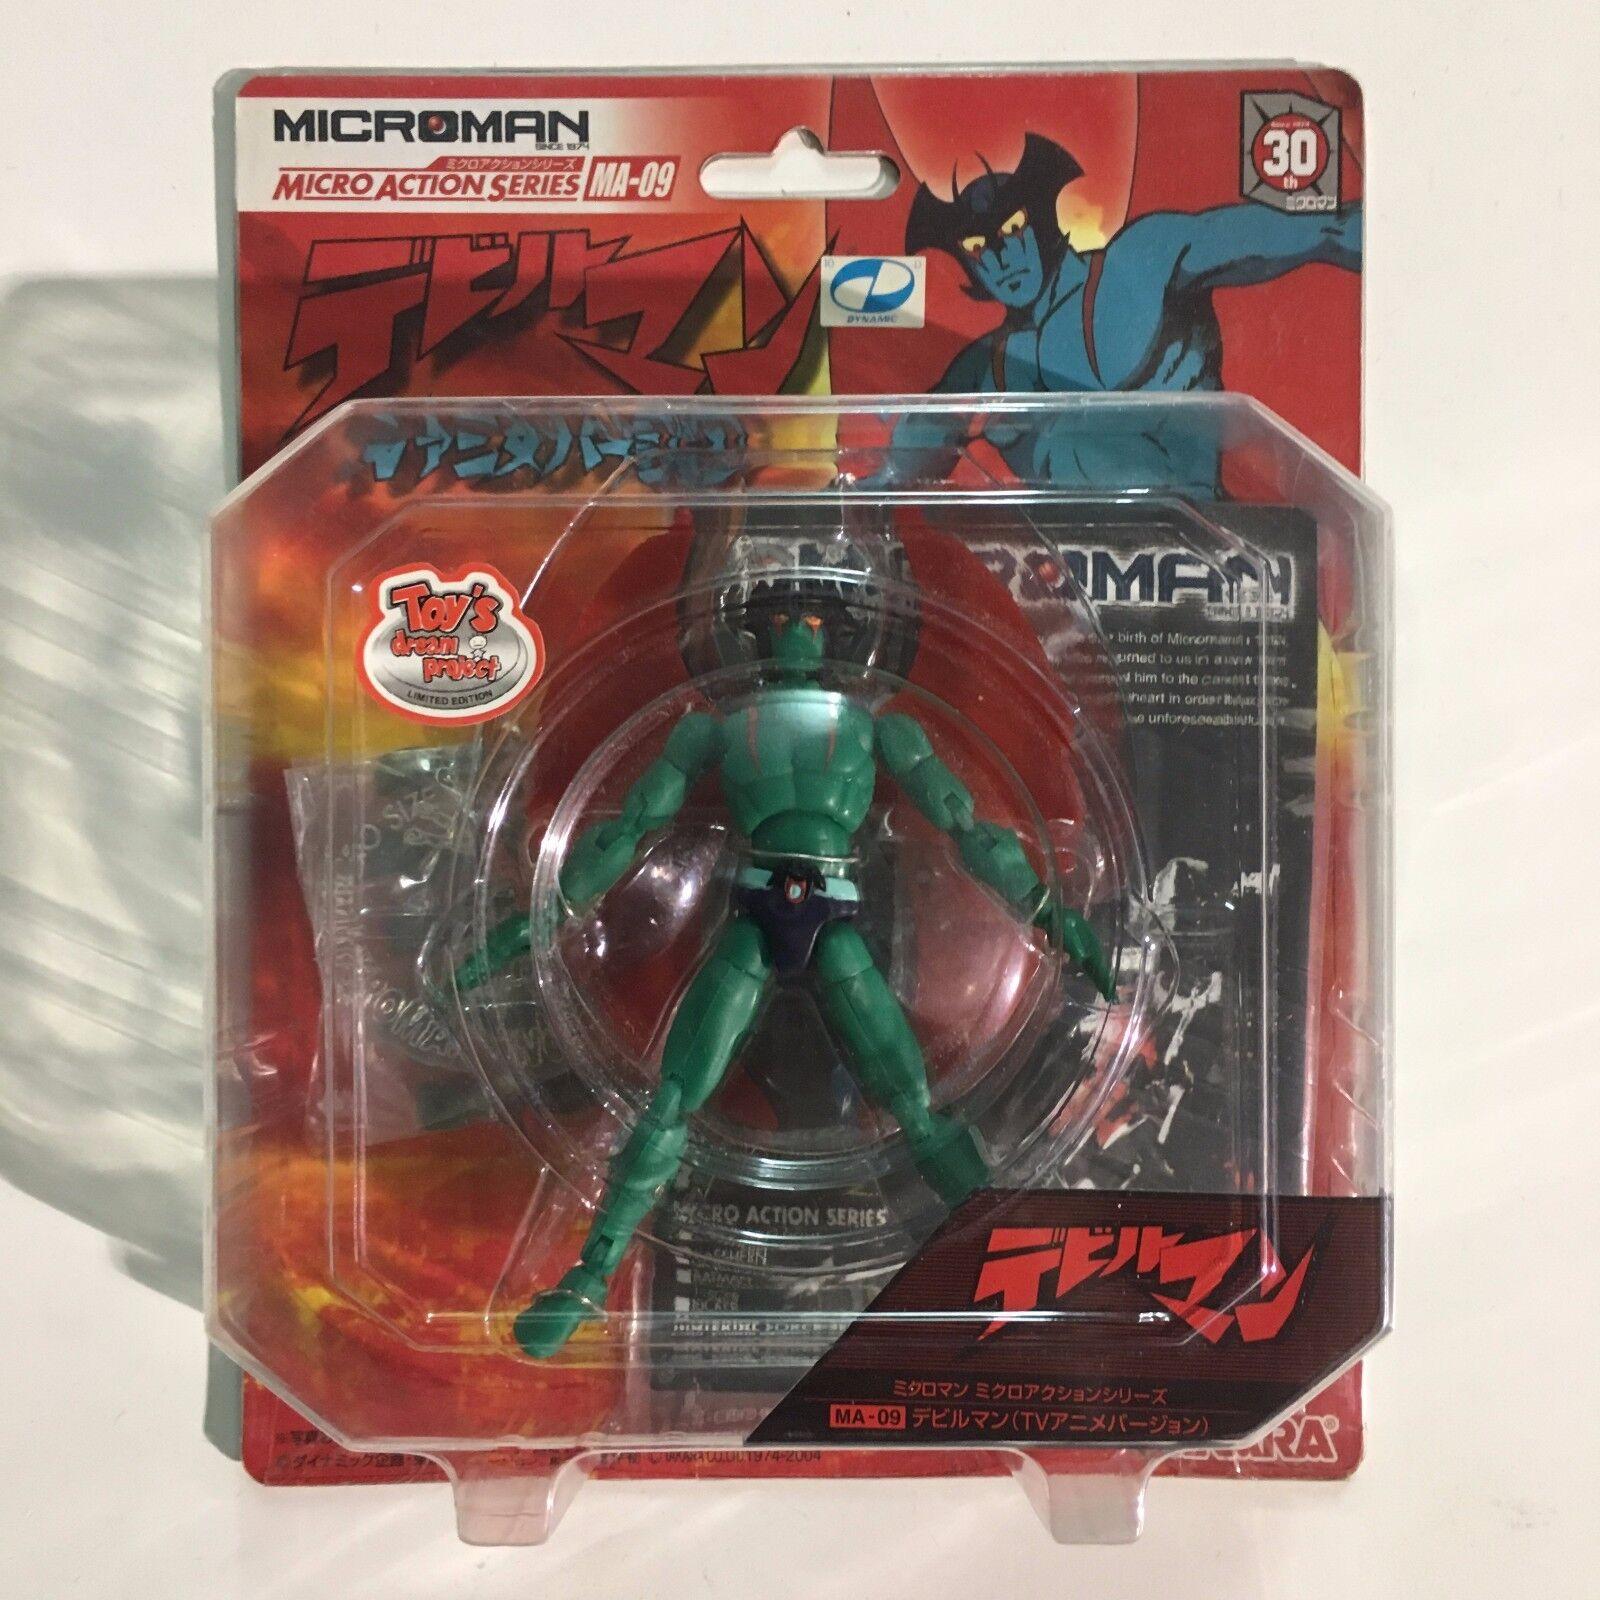 MICROMAN - MICRO ACTION SERIES - MA-09 DEVILMAN Green Version Takara Anime Japan